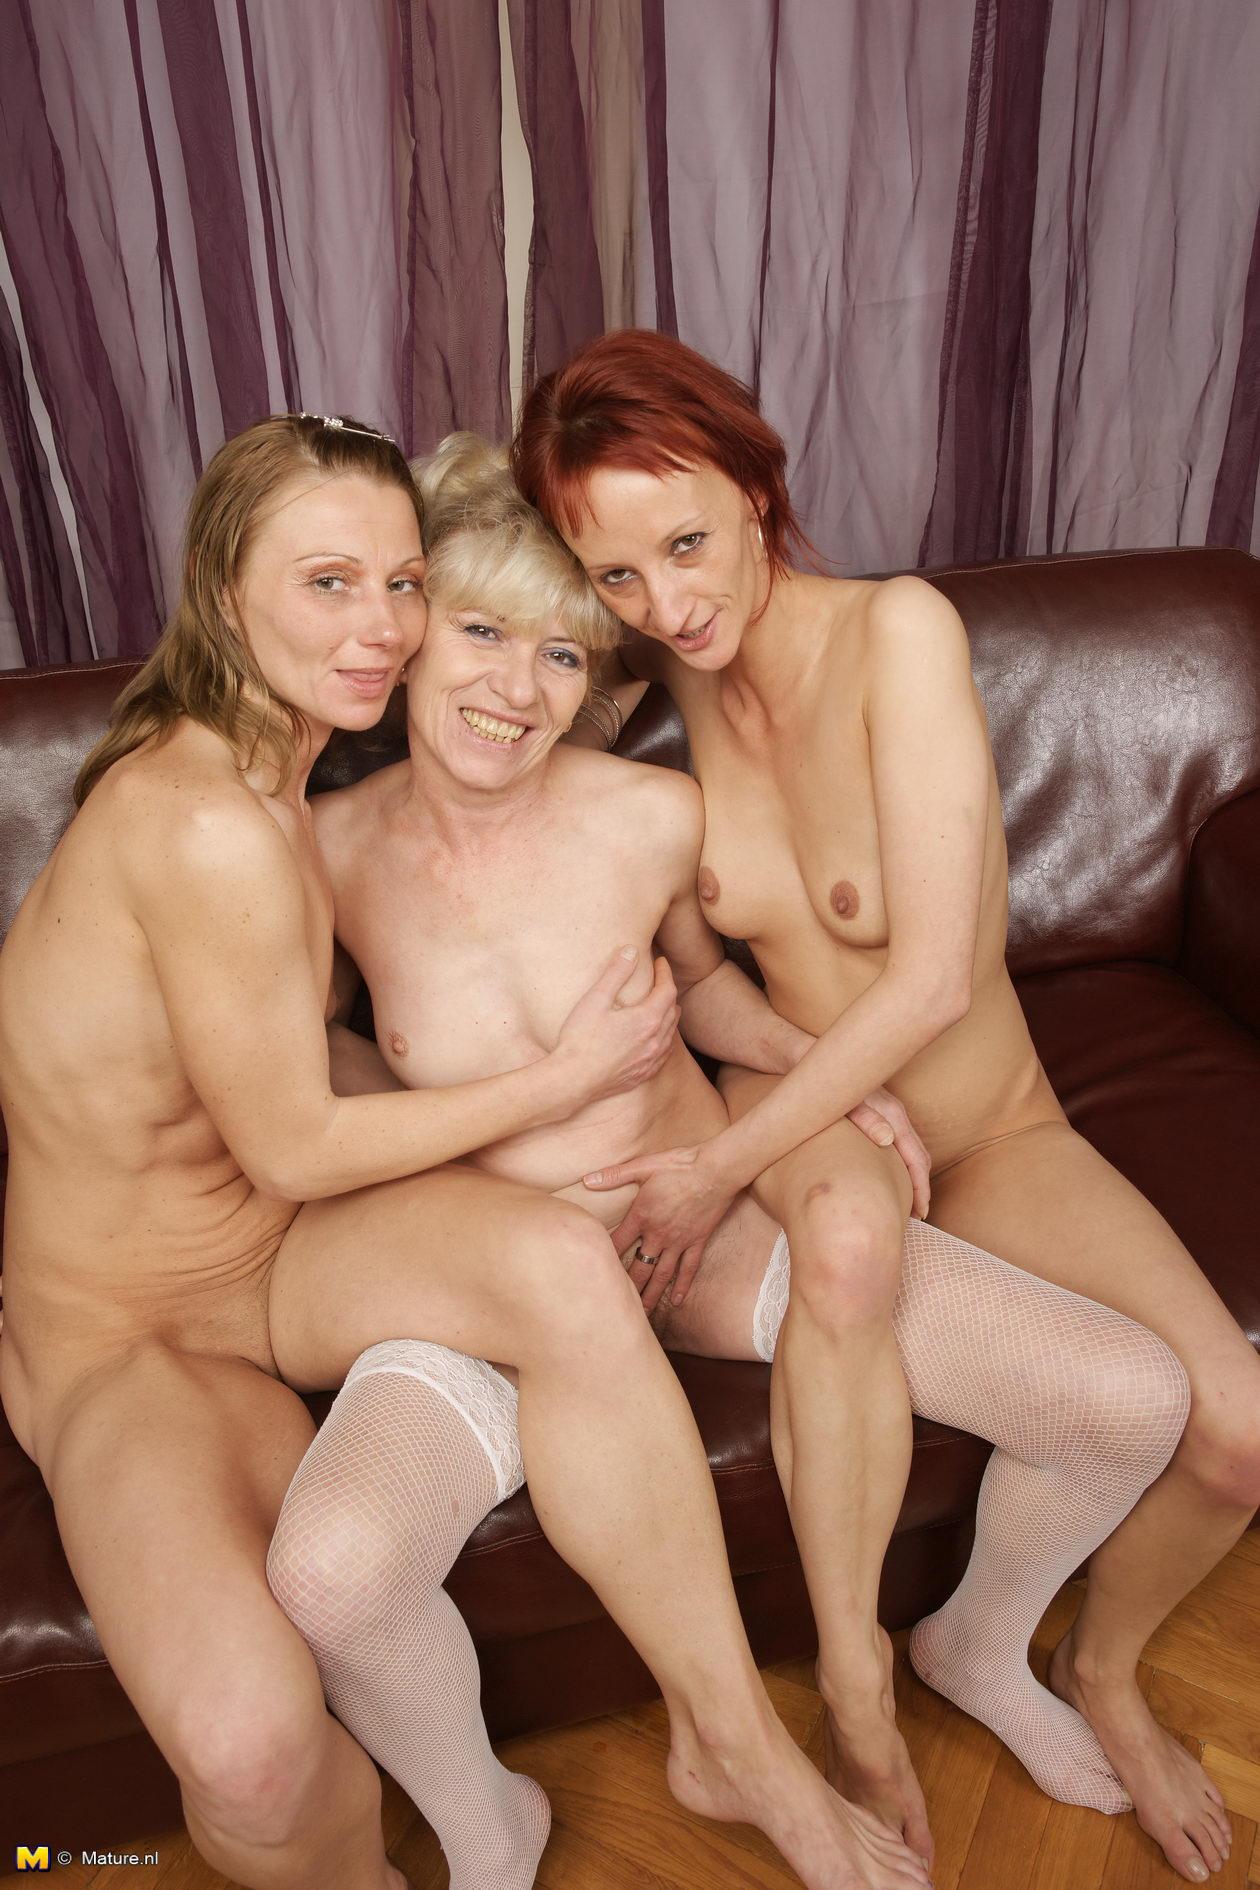 Lesbian sex in hot tub video